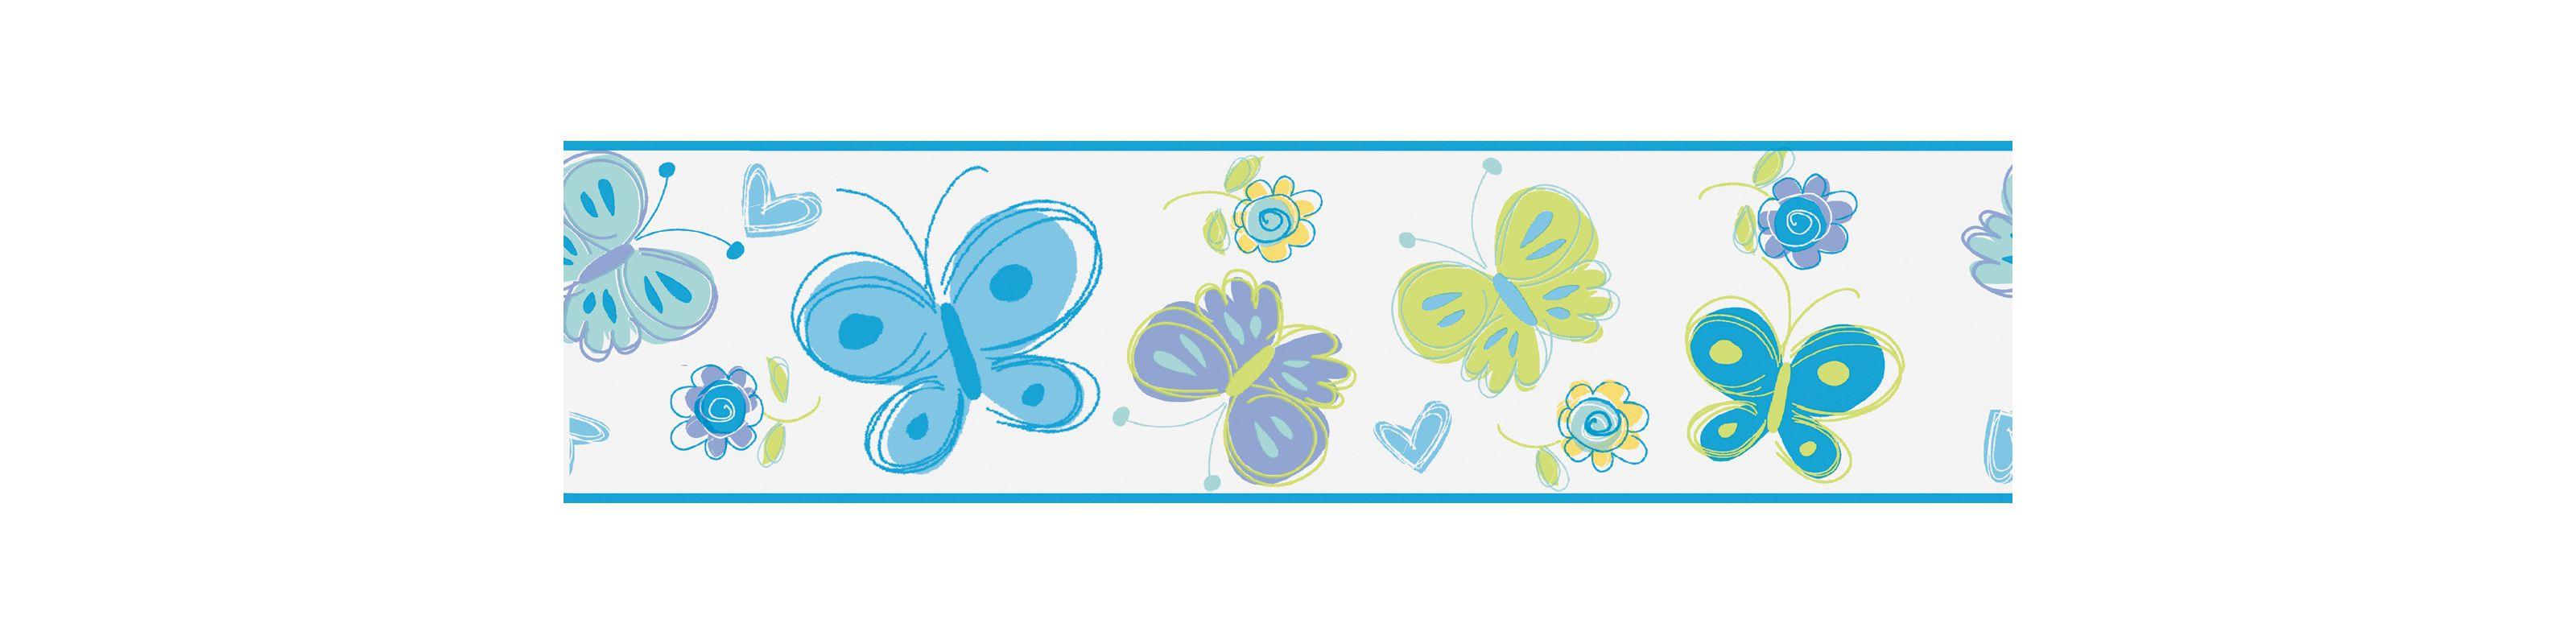 Brewster 443B97629 Butterfly Garden Border Blue Butterfly Border Blue